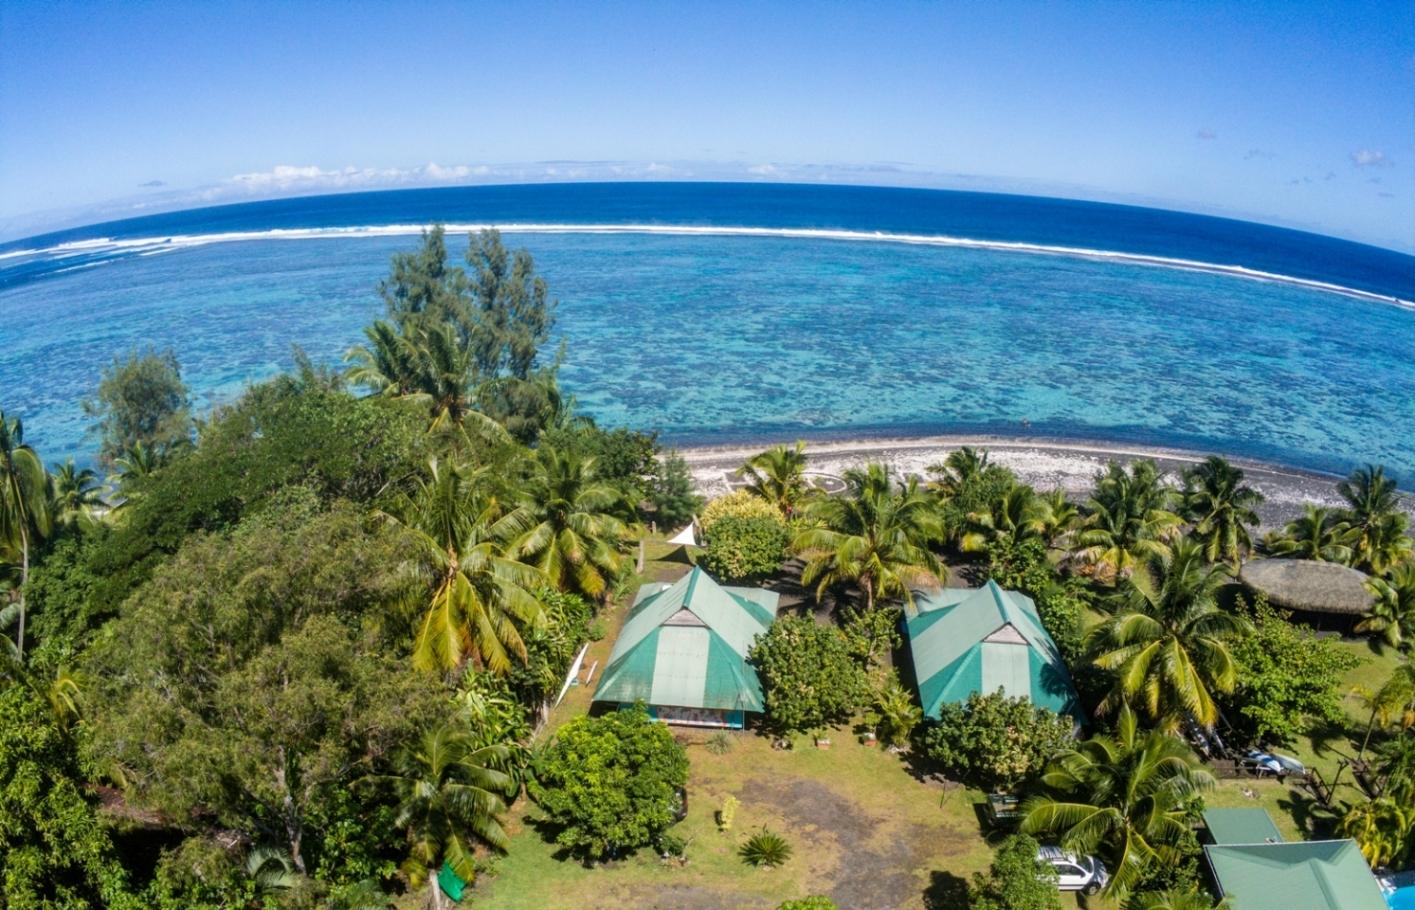 https://tahititourisme.de/wp-content/uploads/2019/08/copie-Tahiti-tourisme-948ko.jpg